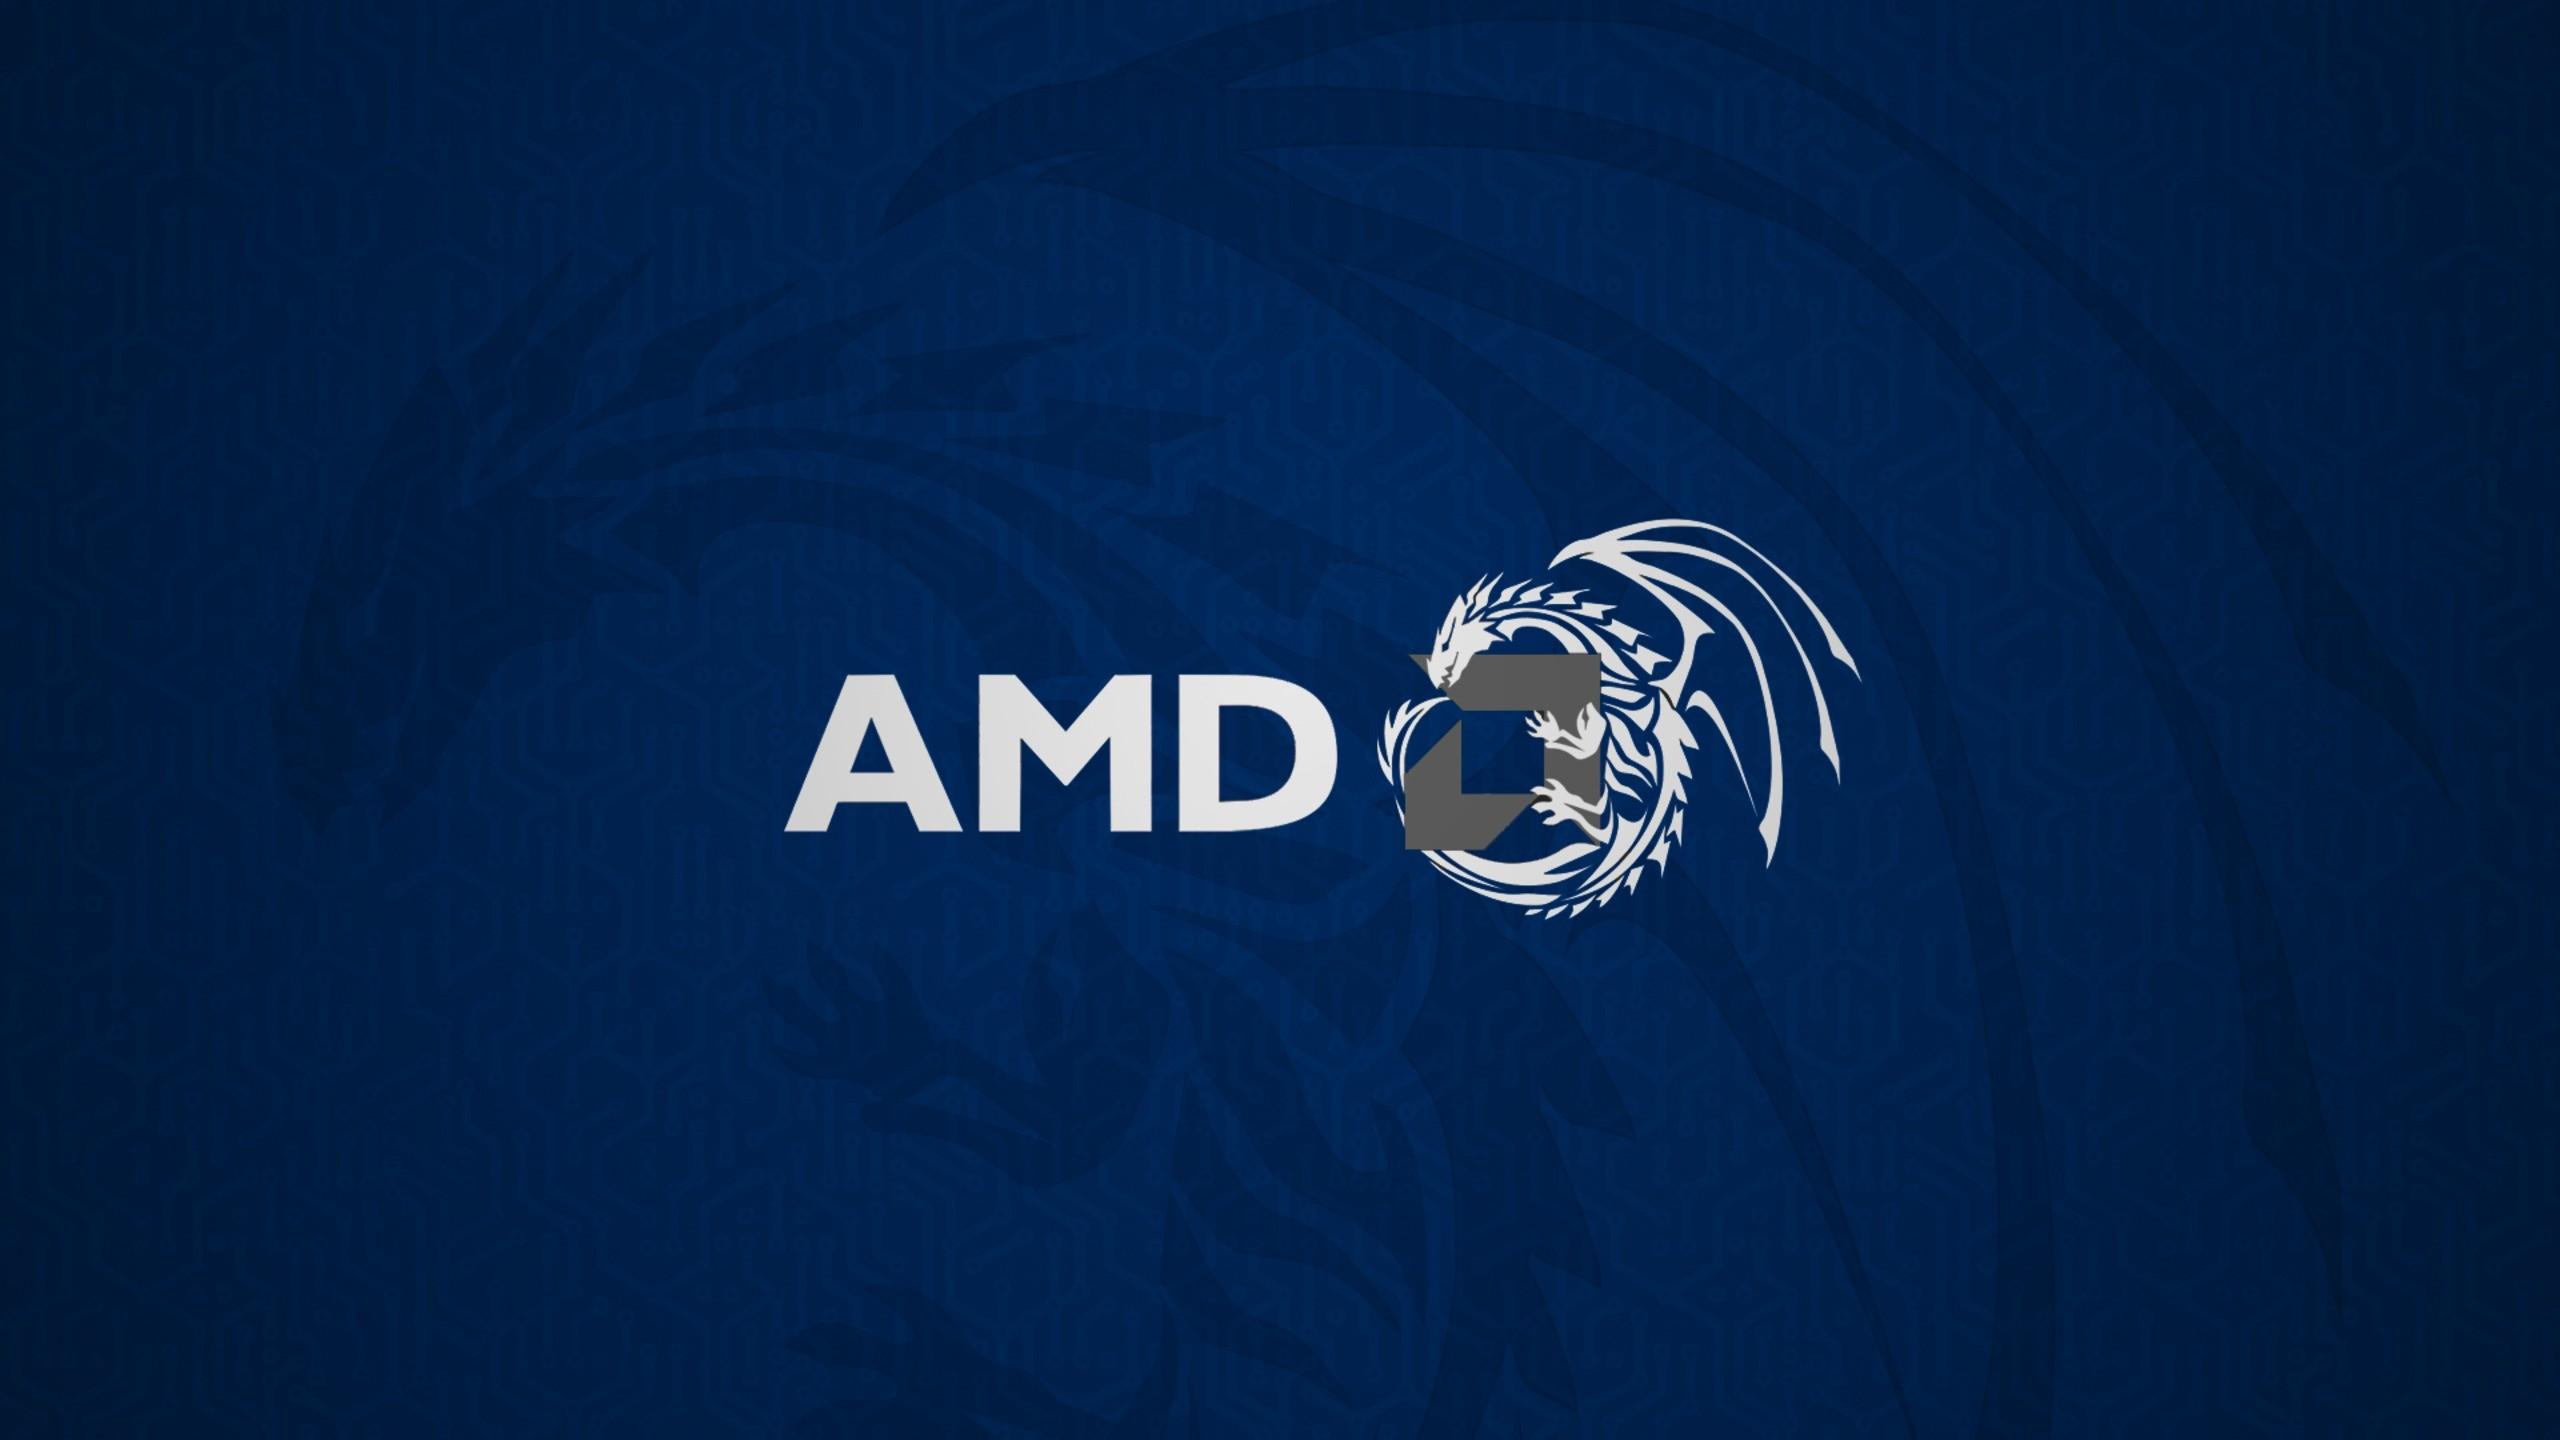 amd-blue-dragon-wallpaper.jpg